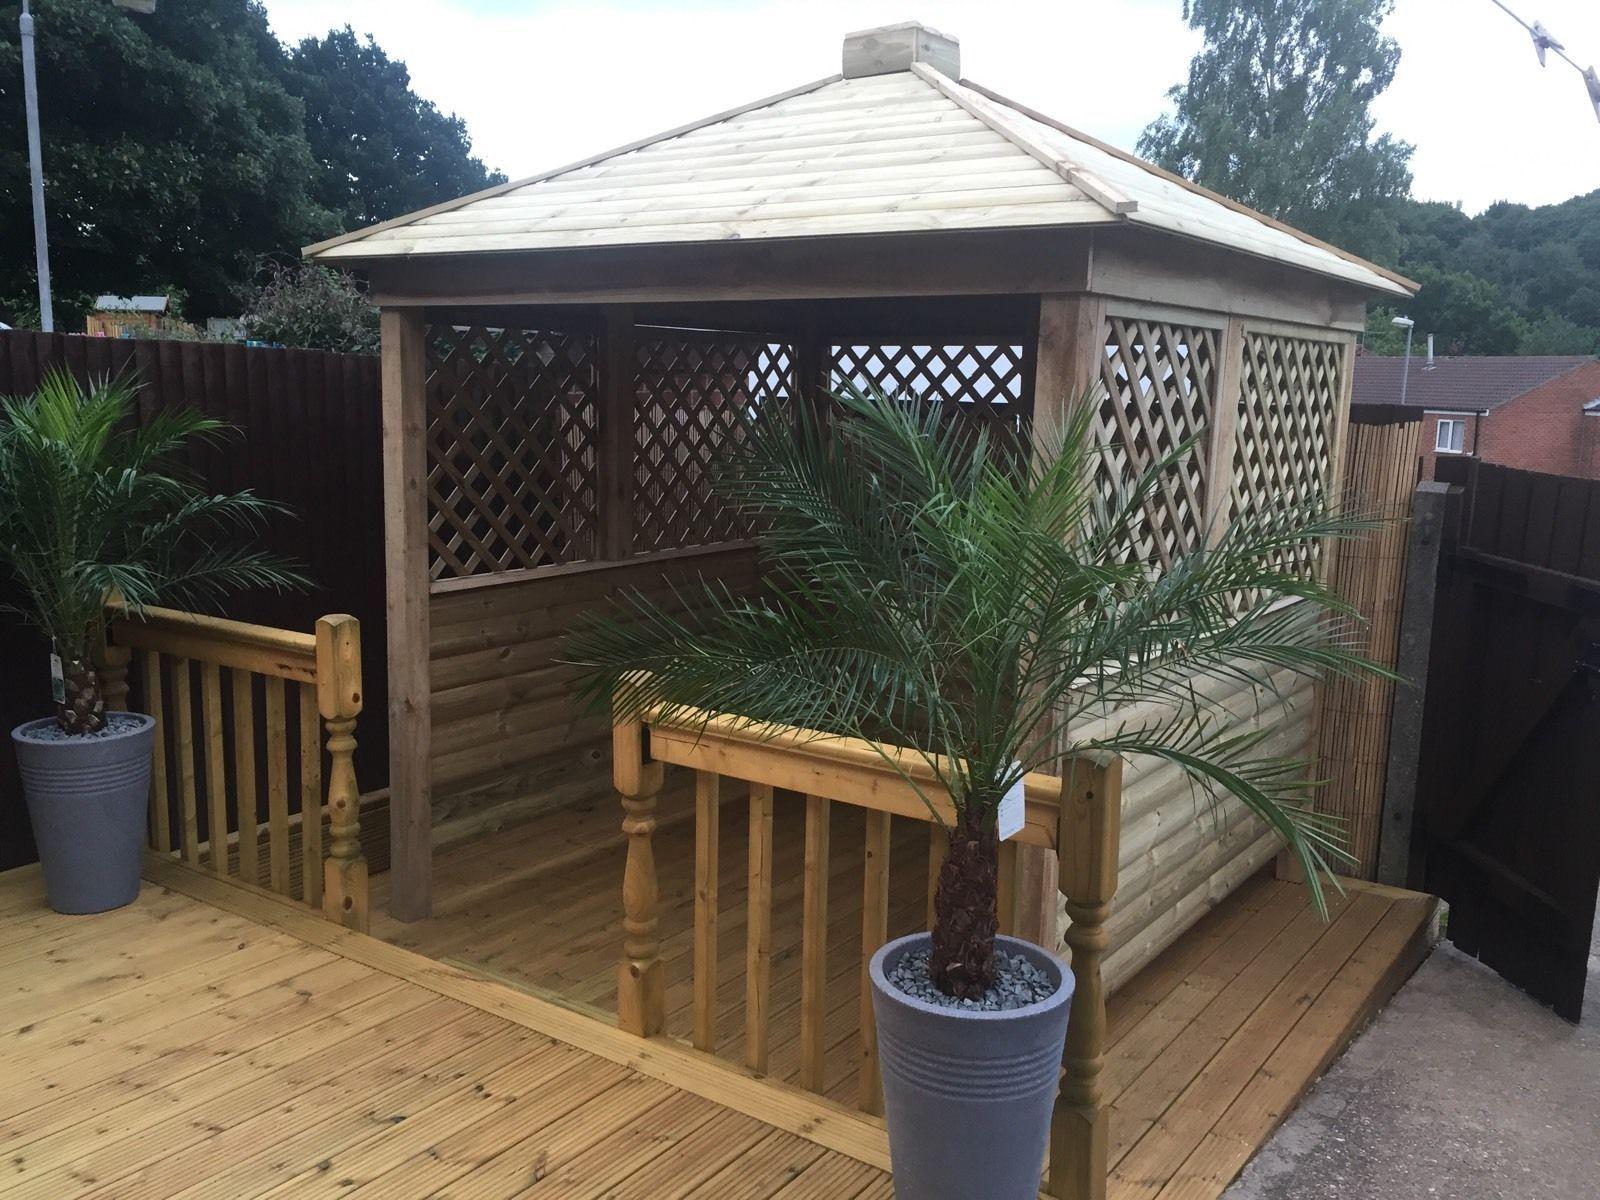 Gazebo Sale On Ebay - Gazebo hot tub shelter wooden seating area garden bar wood private and enclosed ebay